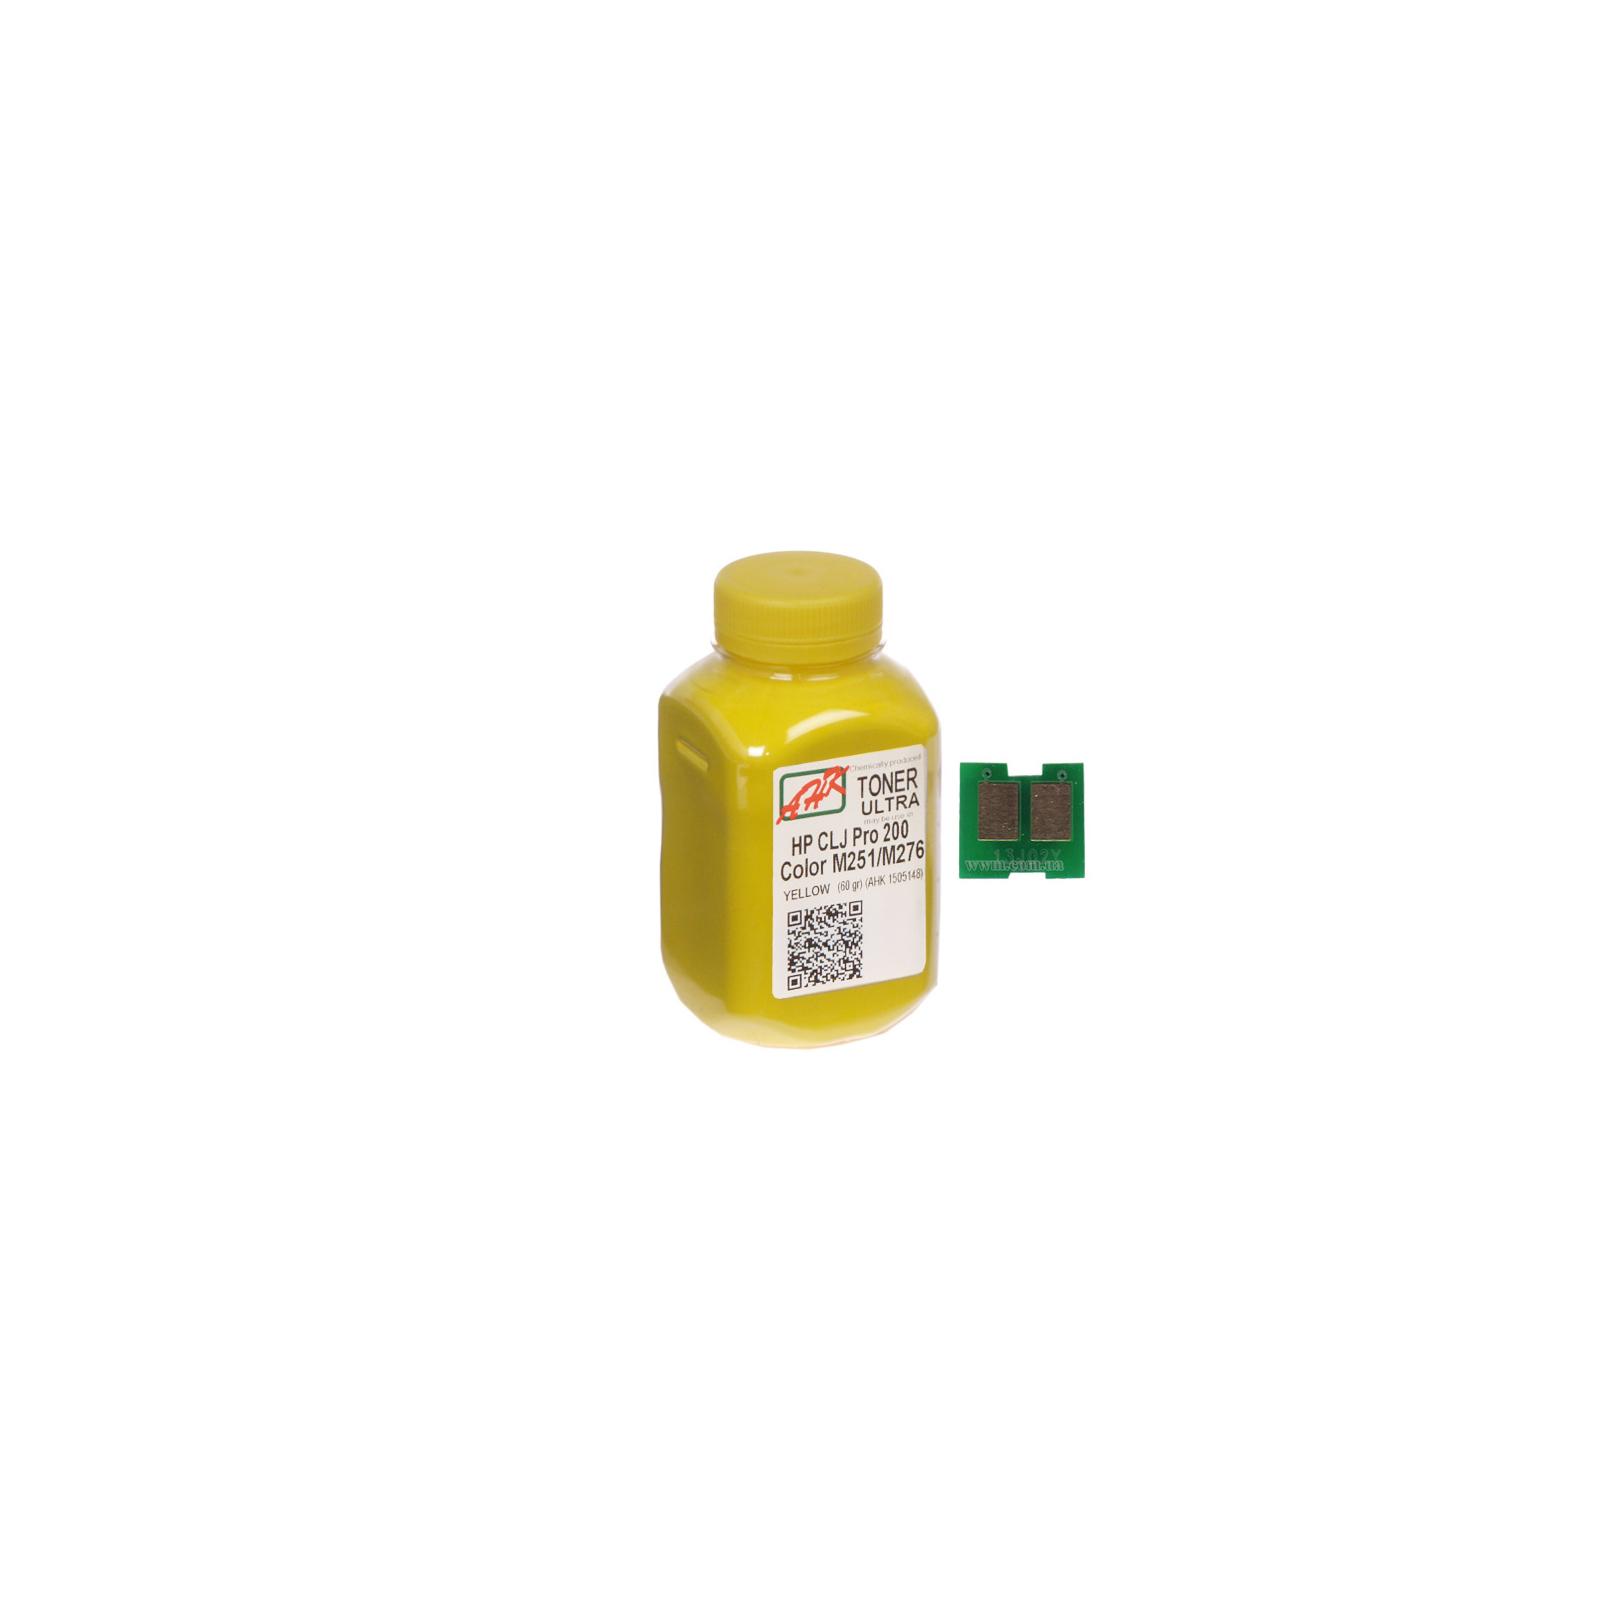 Тонер AHK HP CLJ Pro 200/M251/M276n (131A) Yellow+chip (1505160)